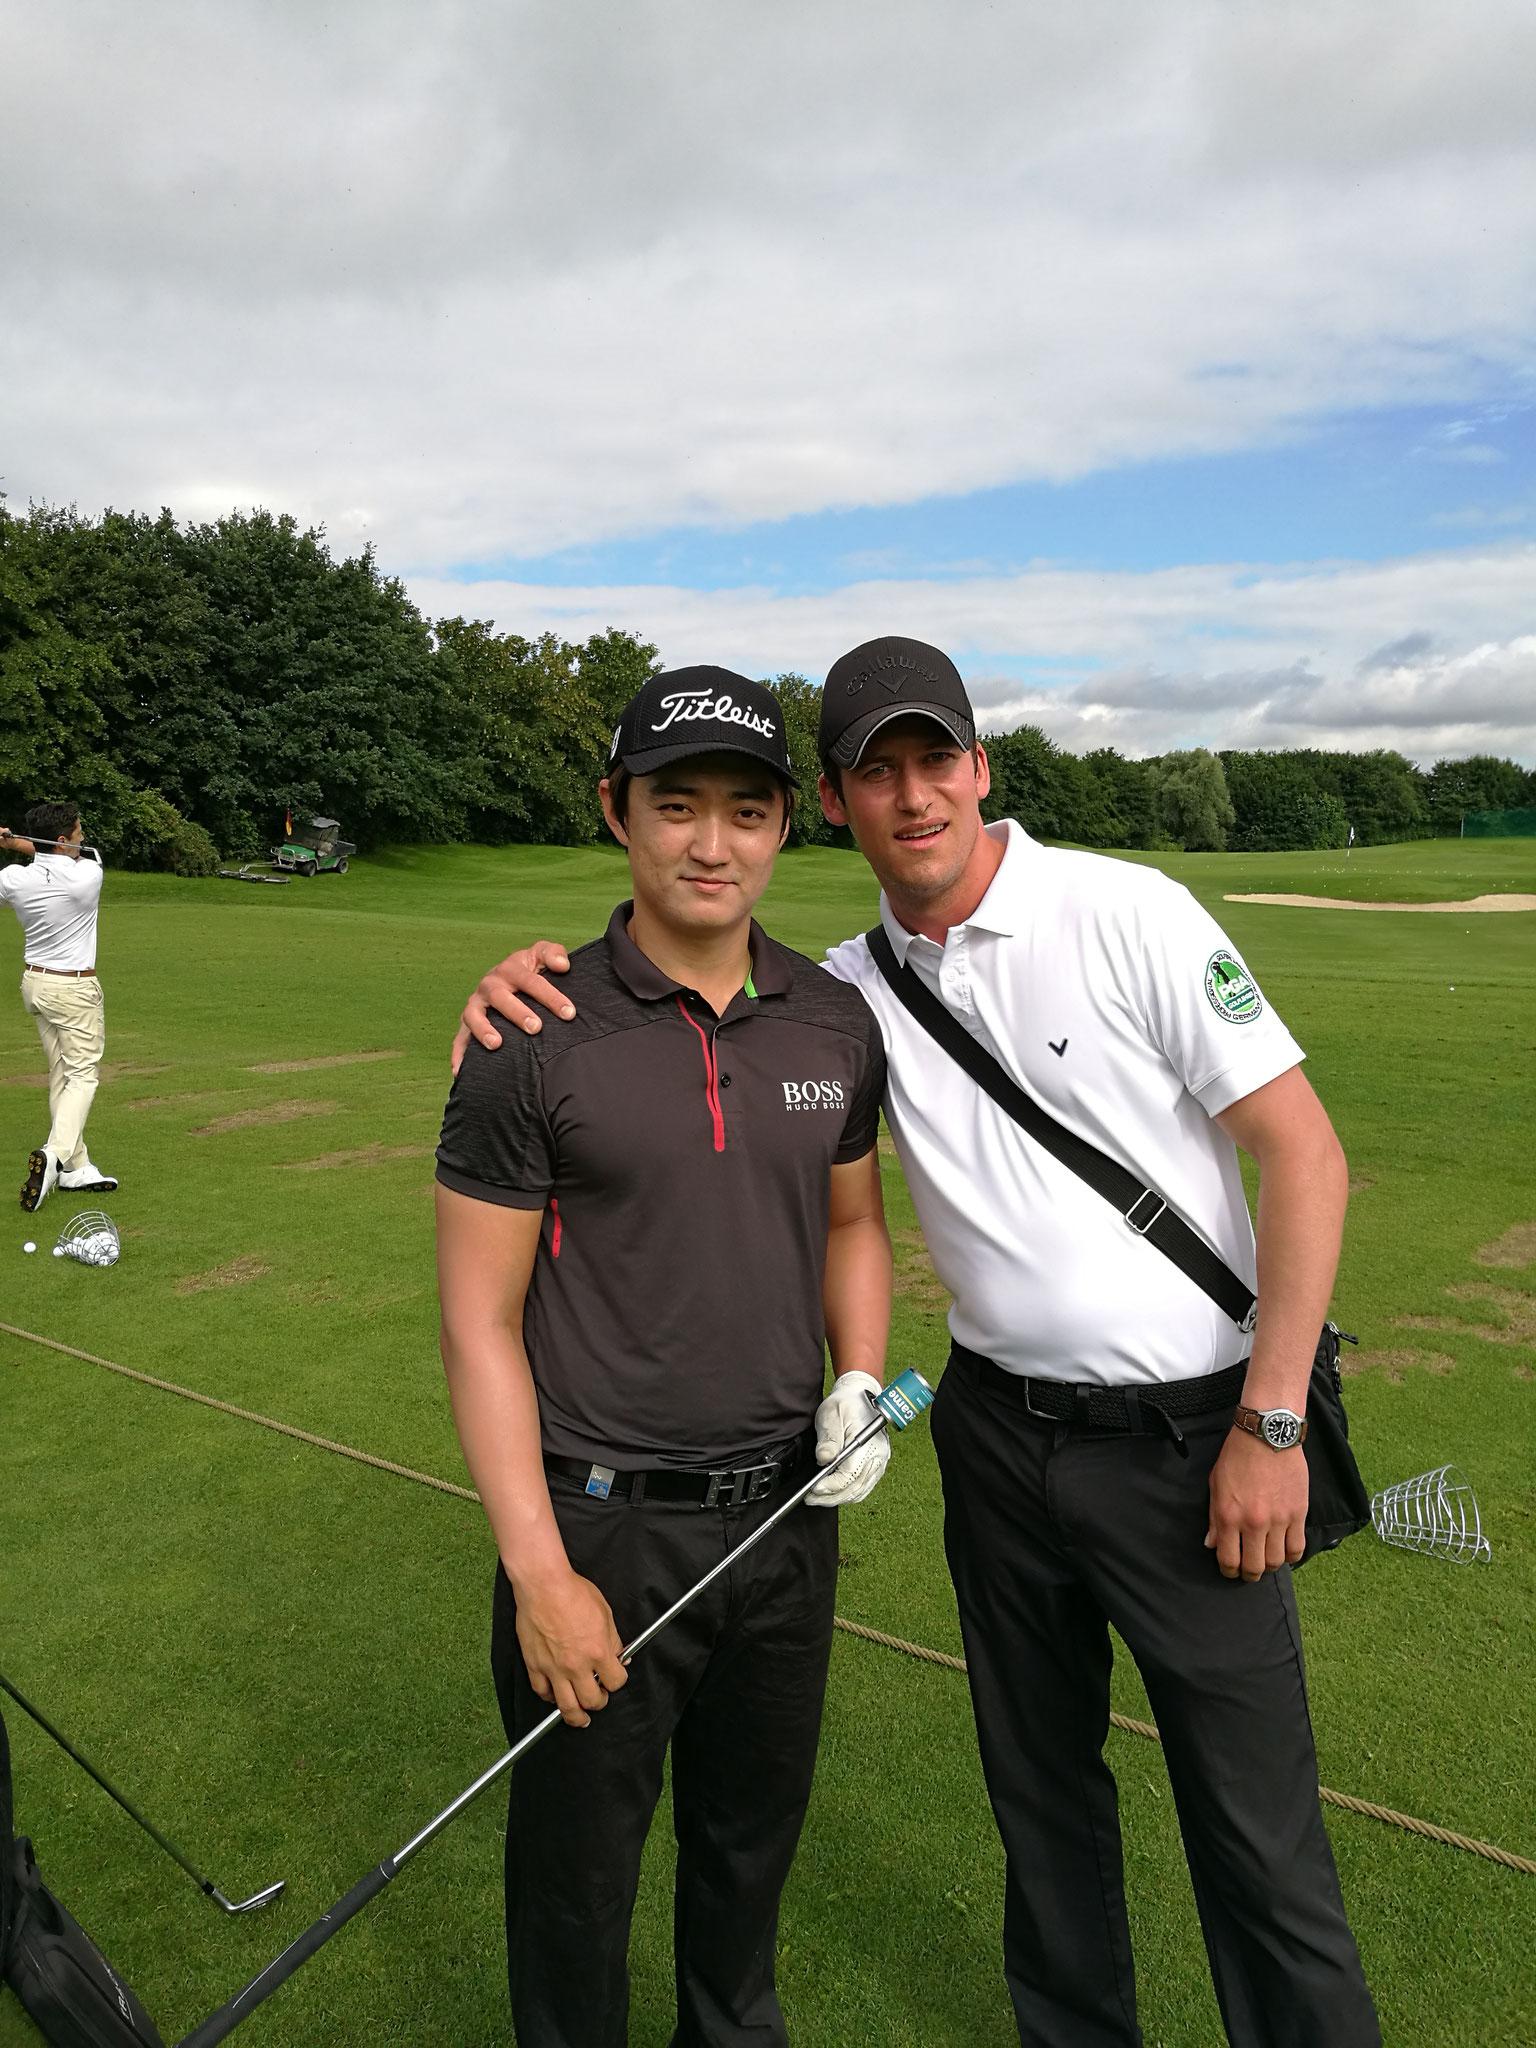 Jin Jong, Australasia Tour Player